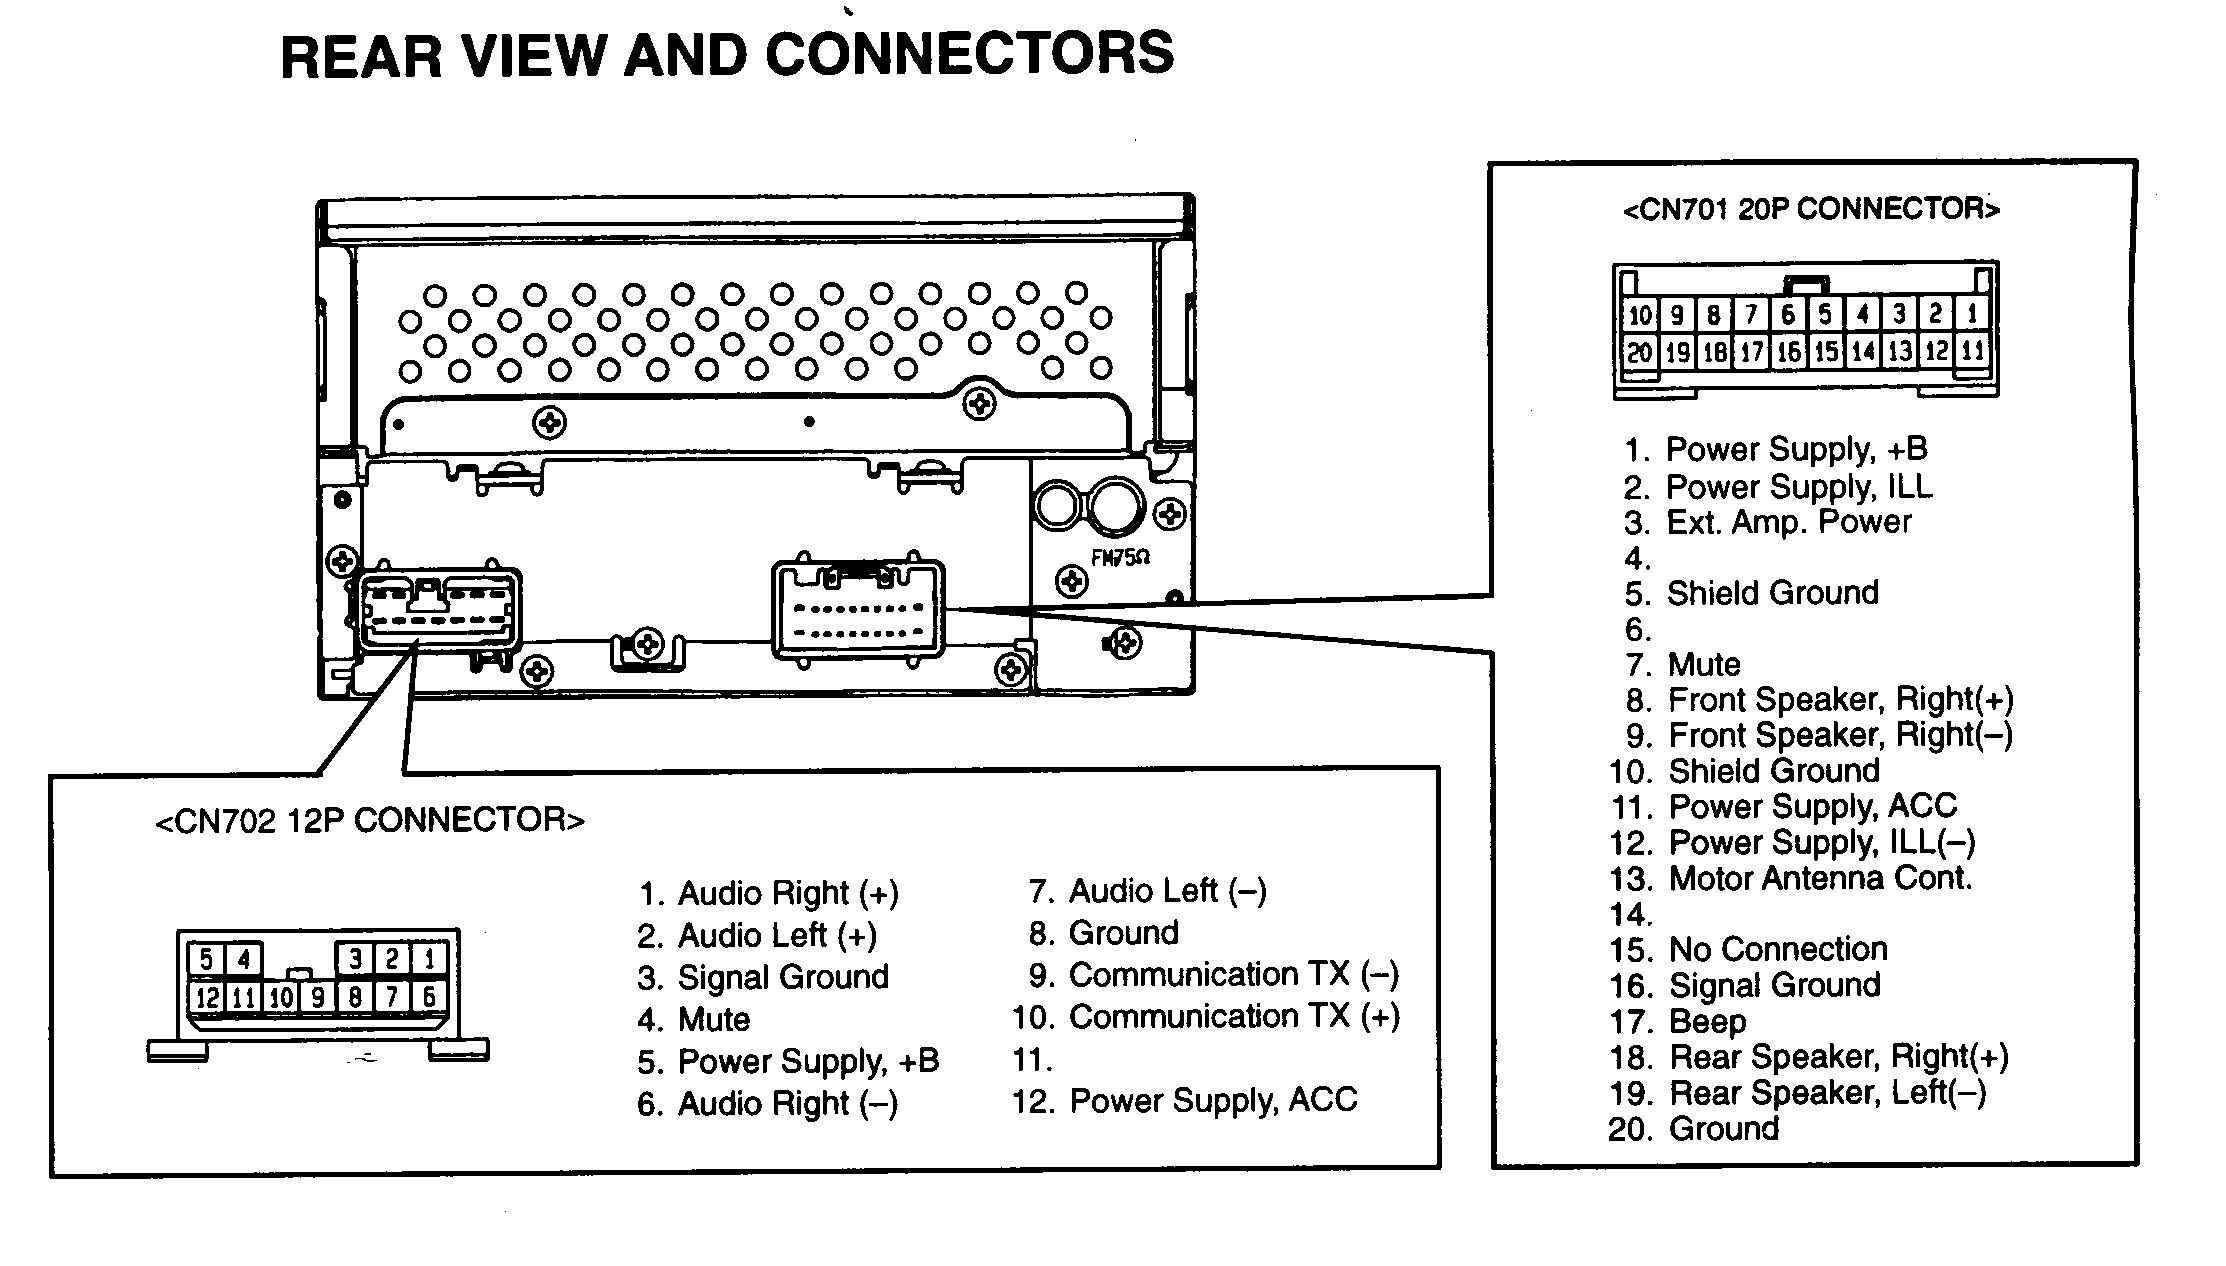 G35 Bosr Wire Diagram Best Of | Wiring Diagram Image Infiniti Q Wiring Diagram on infiniti transfer case, infiniti parts, infiniti fuses, infiniti g20 repair manual, infiniti accessories,